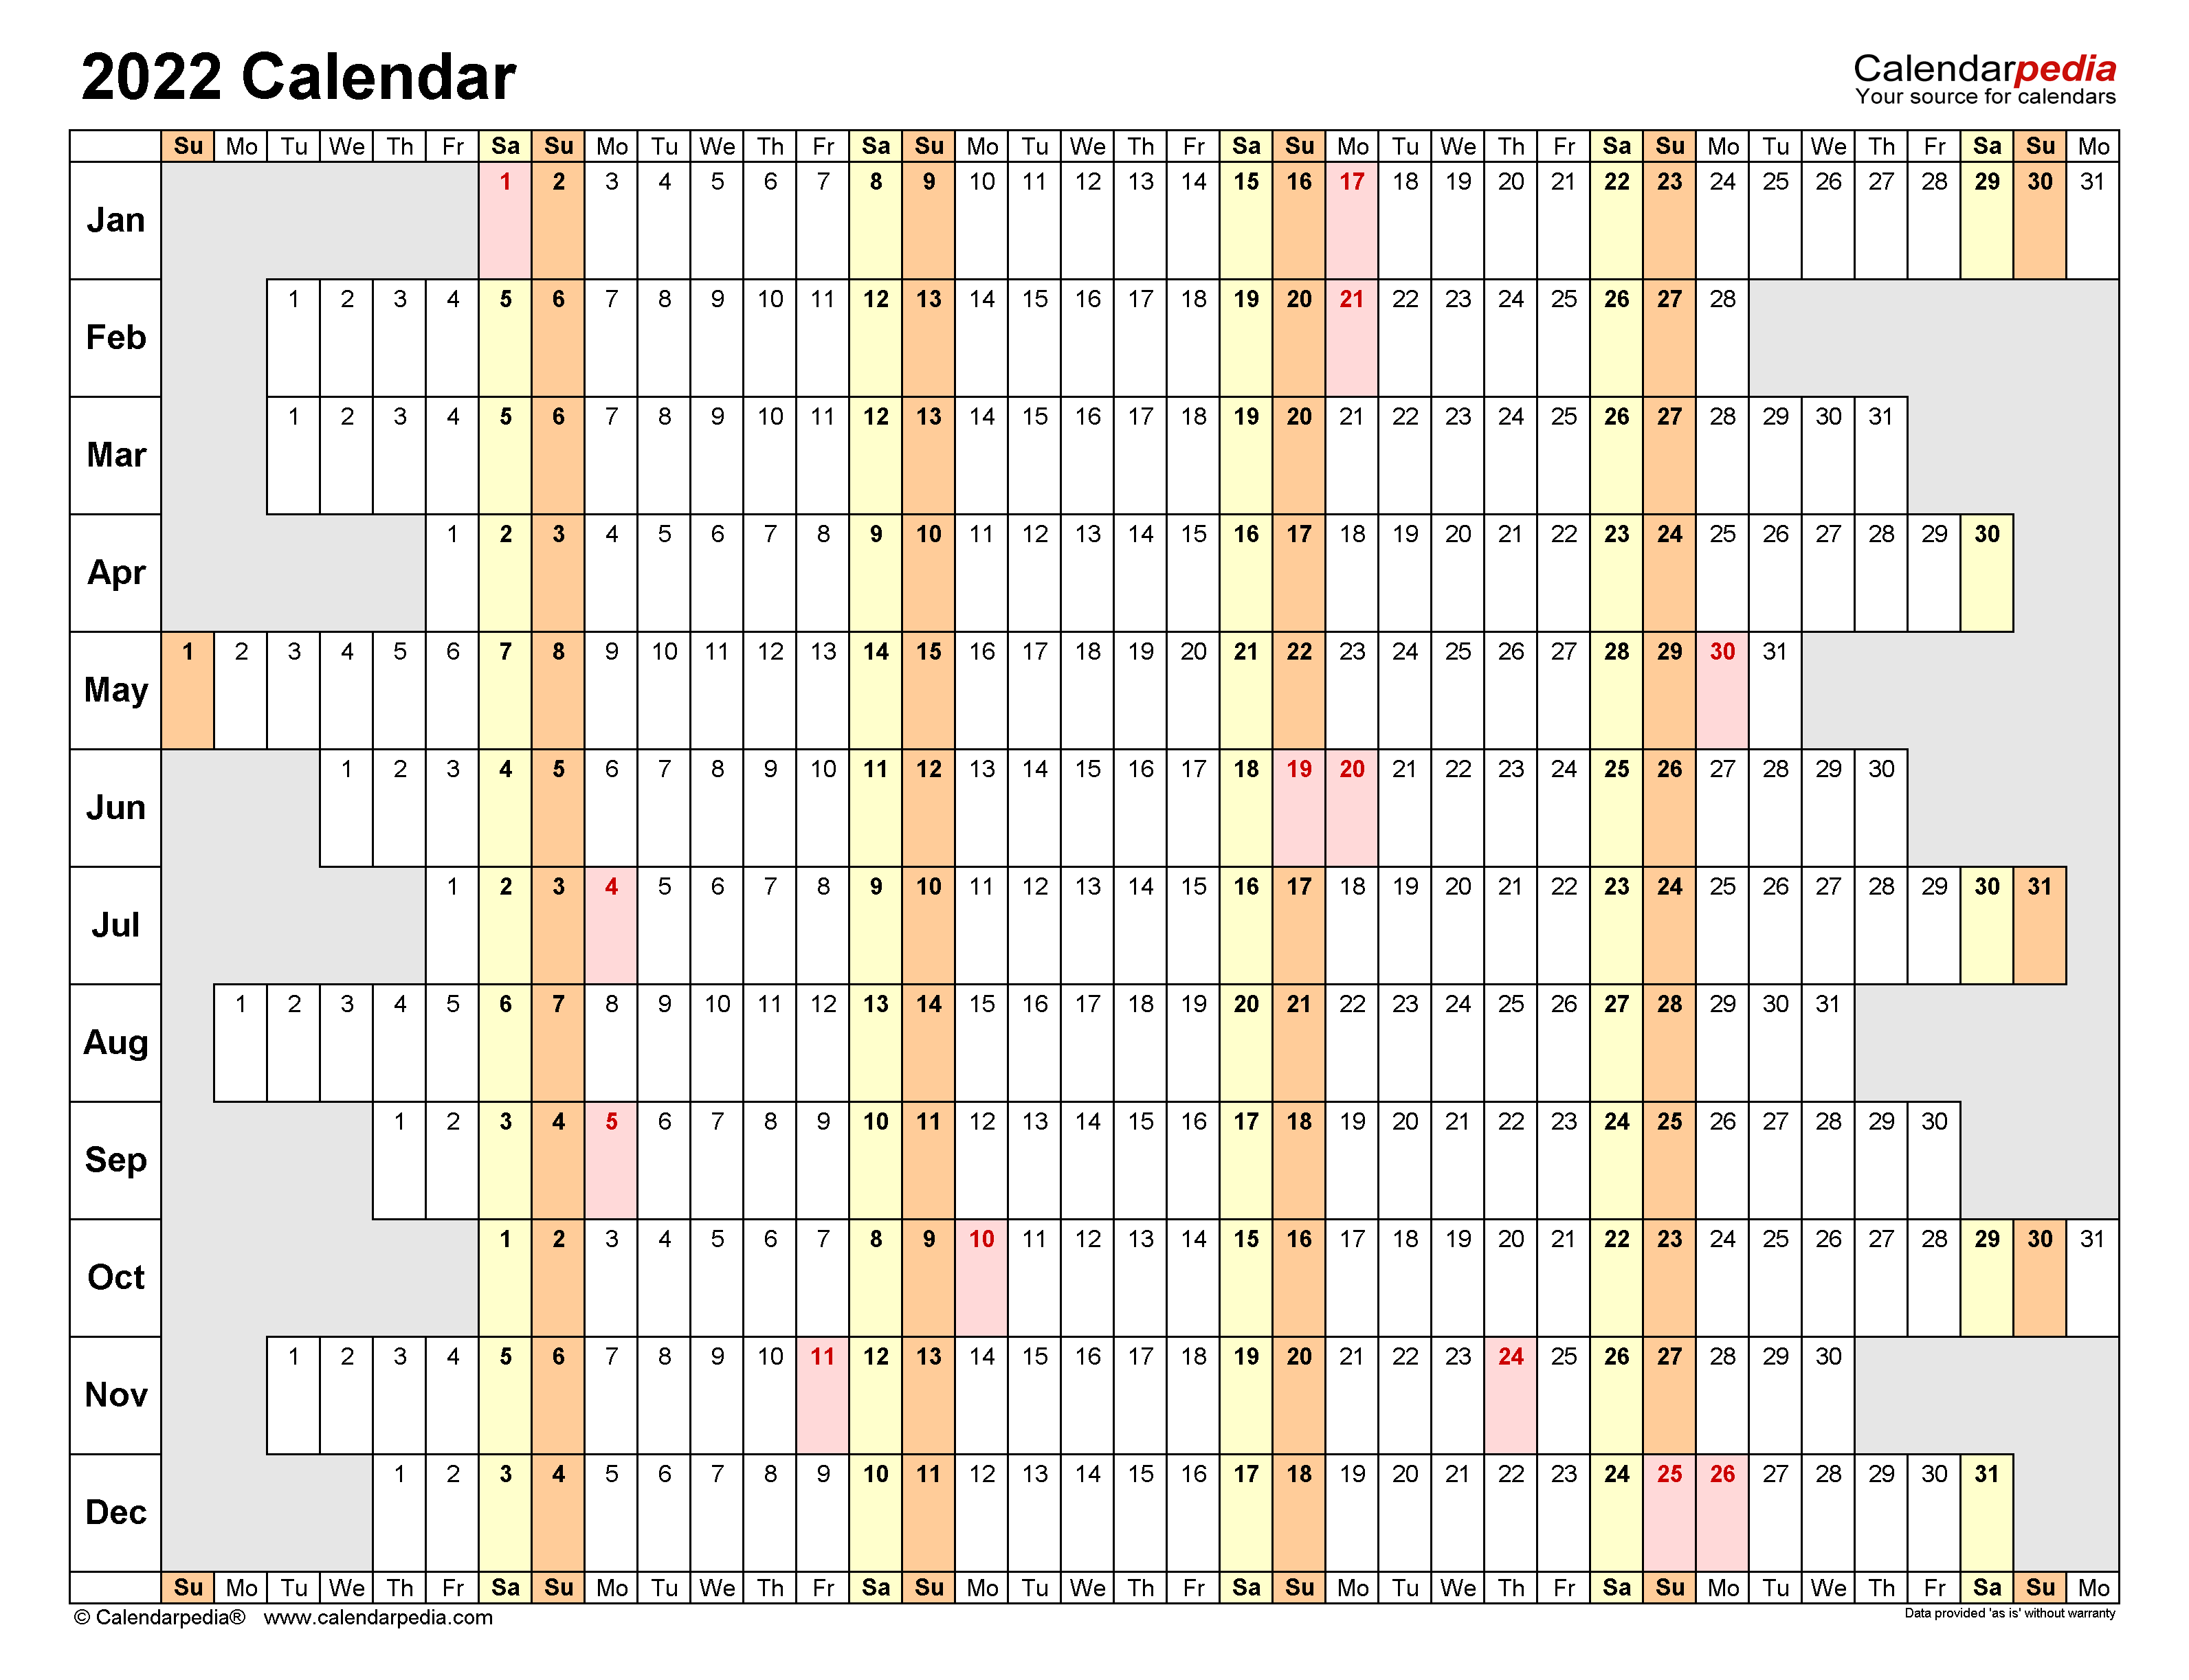 Winword Calendar 2022.2022 Calendar Free Printable Word Templates Calendarpedia